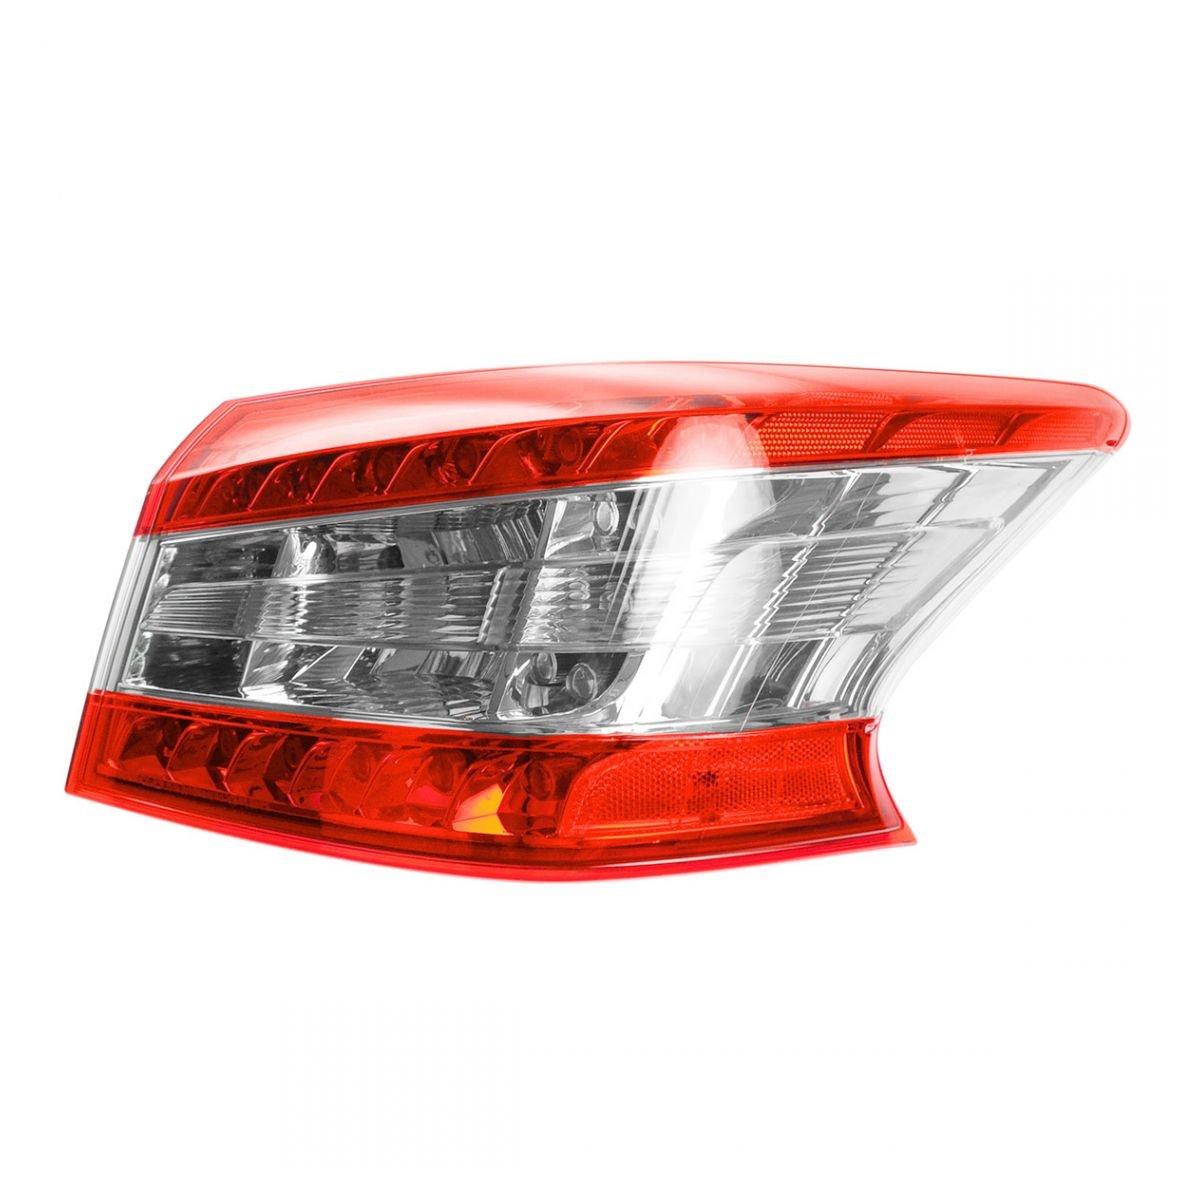 Outer Tail Light Lamp Assembly RH Right Passenger Side for Dodge Durango New